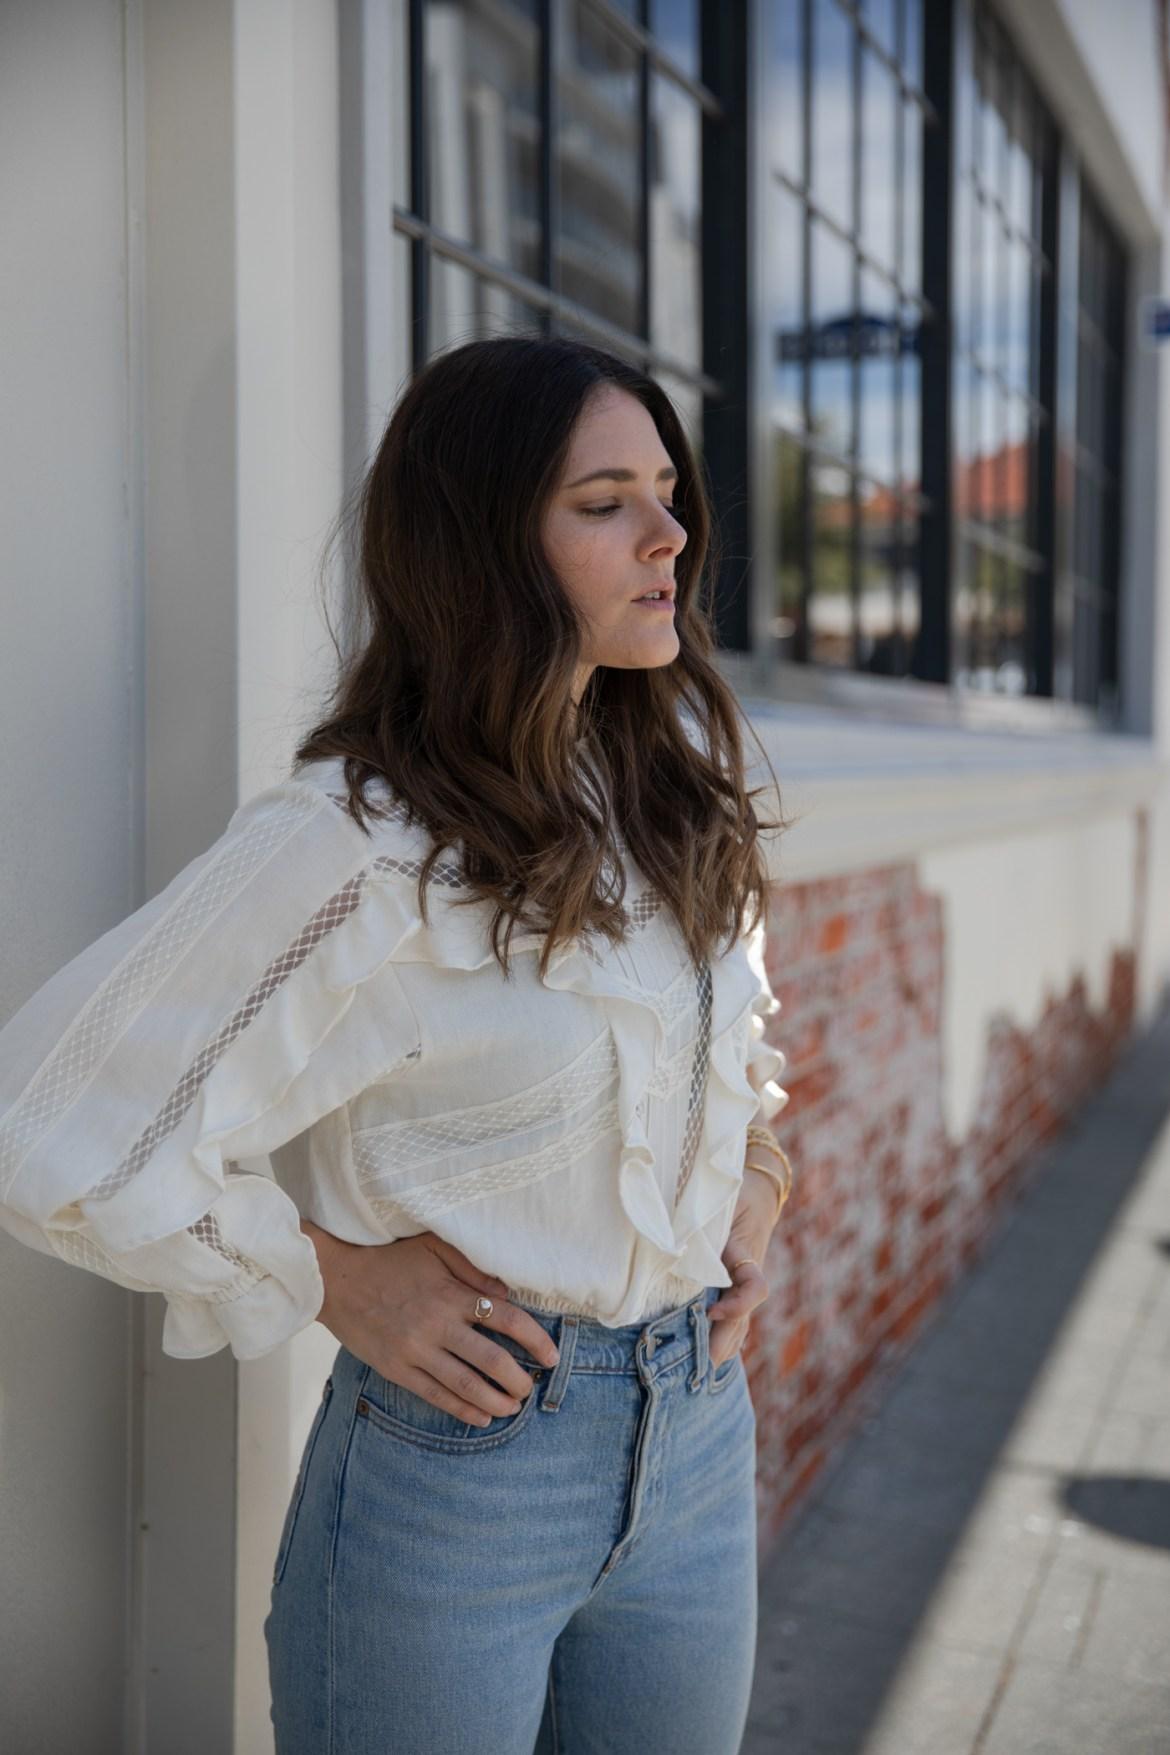 IRO ecru blouse worn with jeans